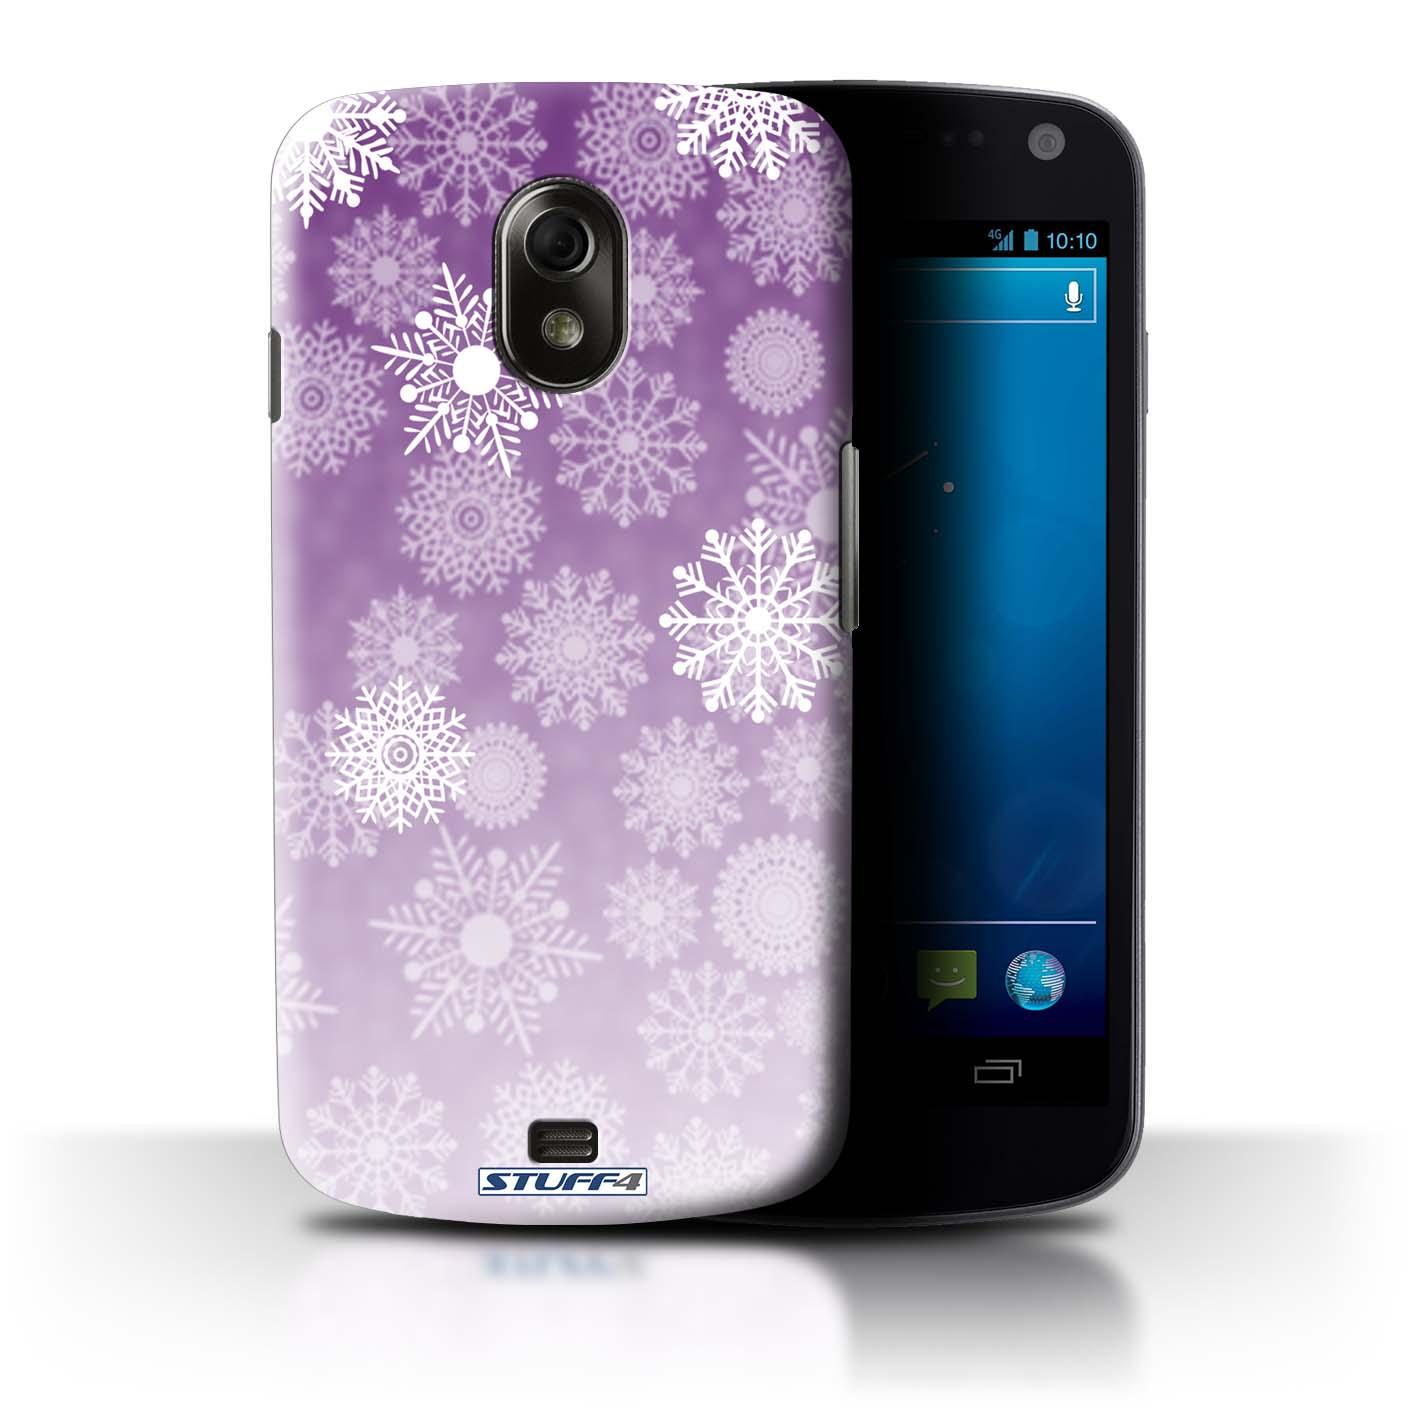 STUFF4-Back-Case-Cover-Skin-for-Samsung-Galaxy-Nexus-3-I9250-Snowflake-Mist